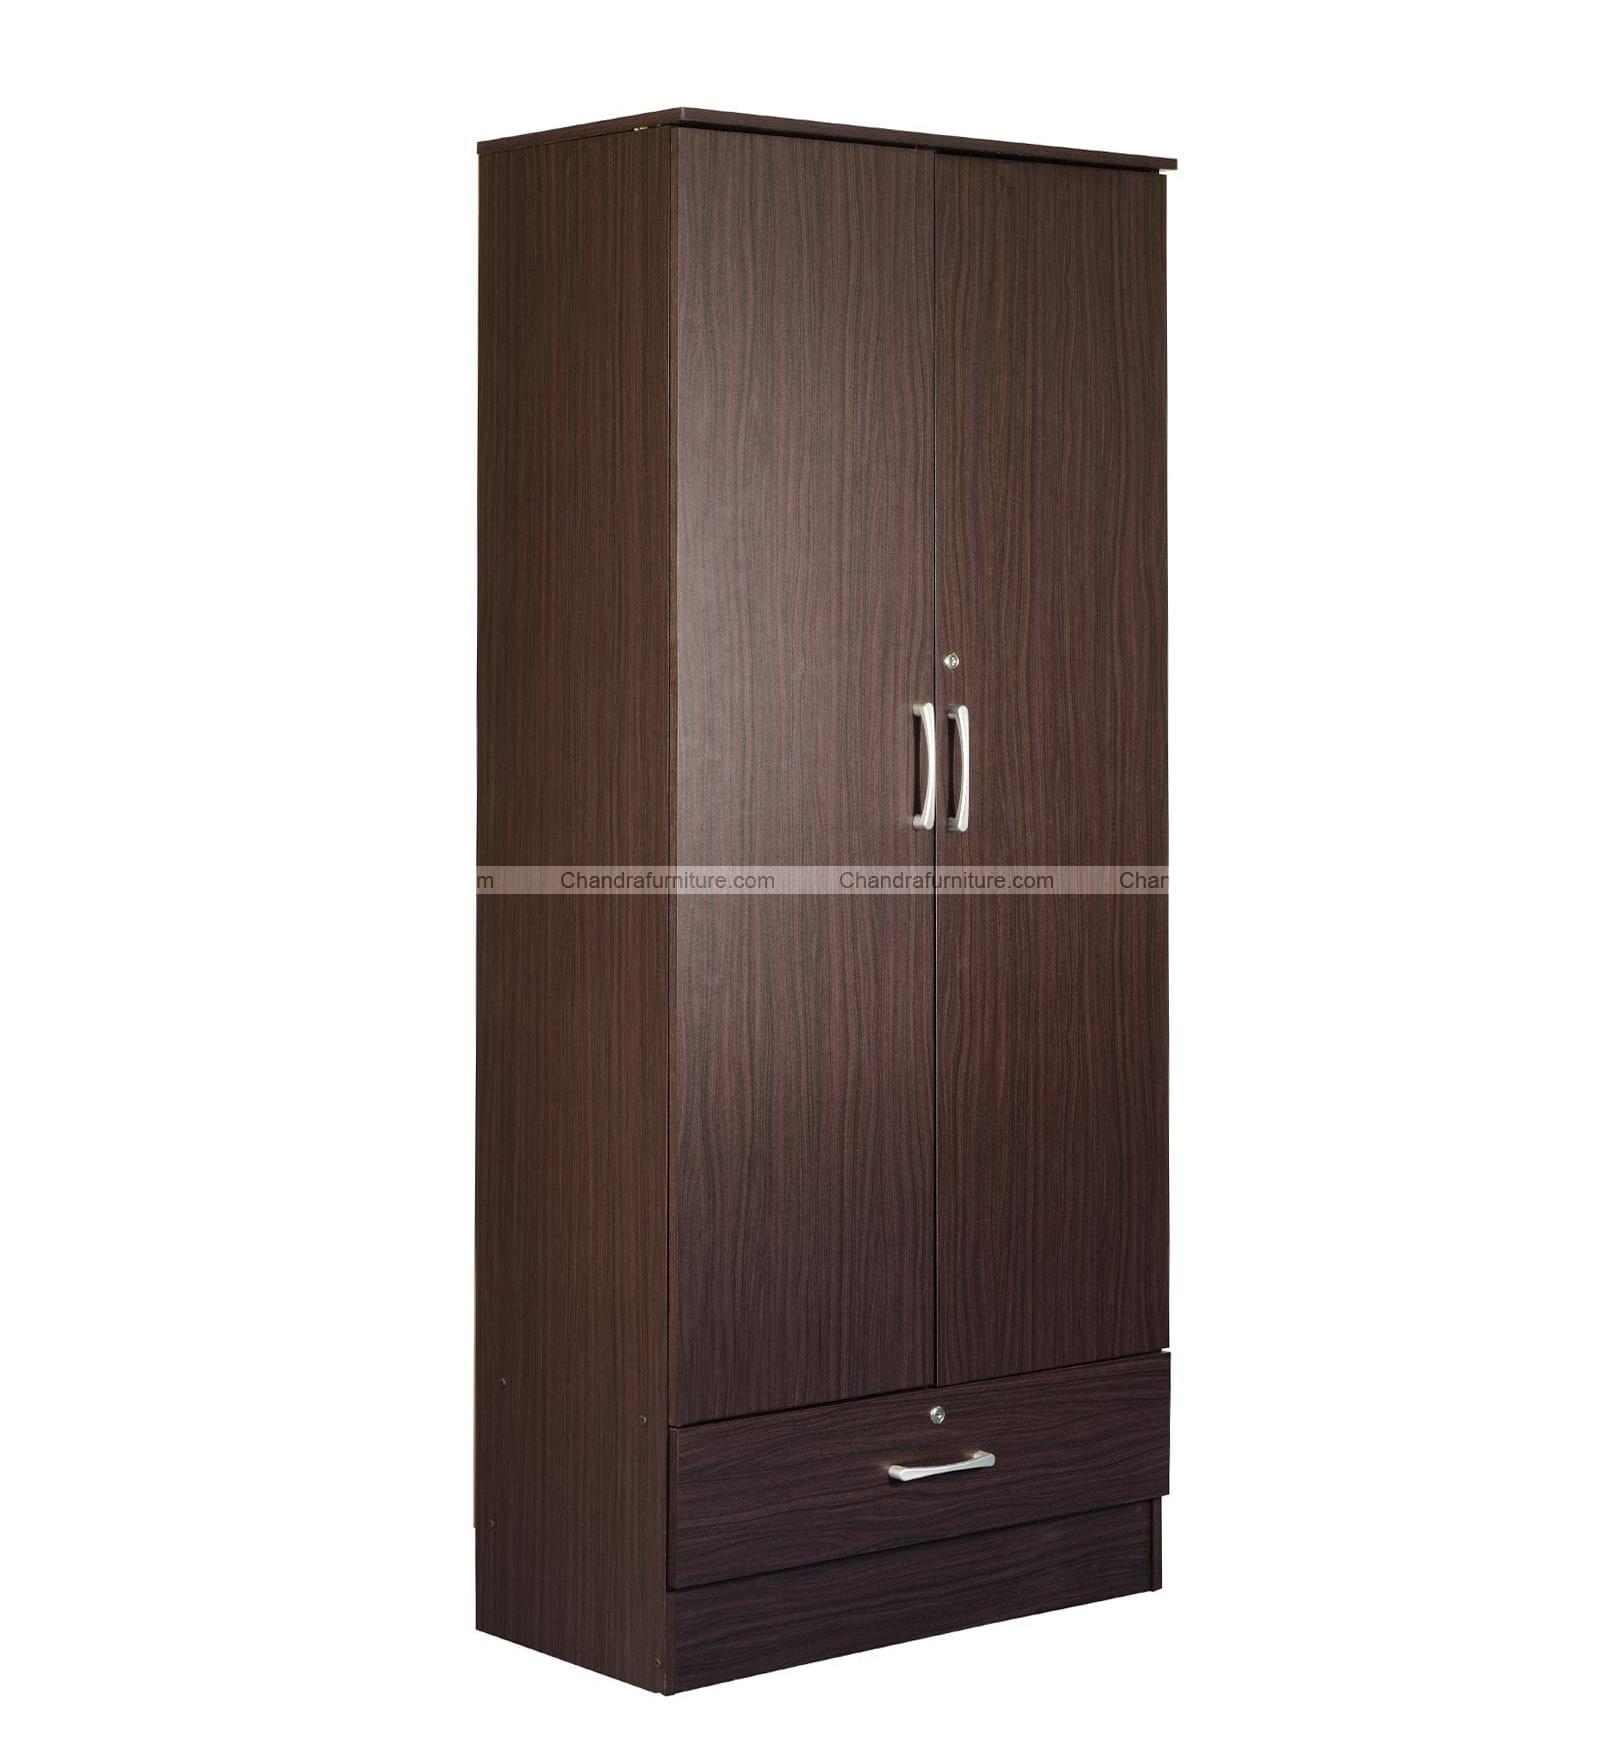 Chandra Furniture Cozy Two Door Wardrobe  Wood Colour